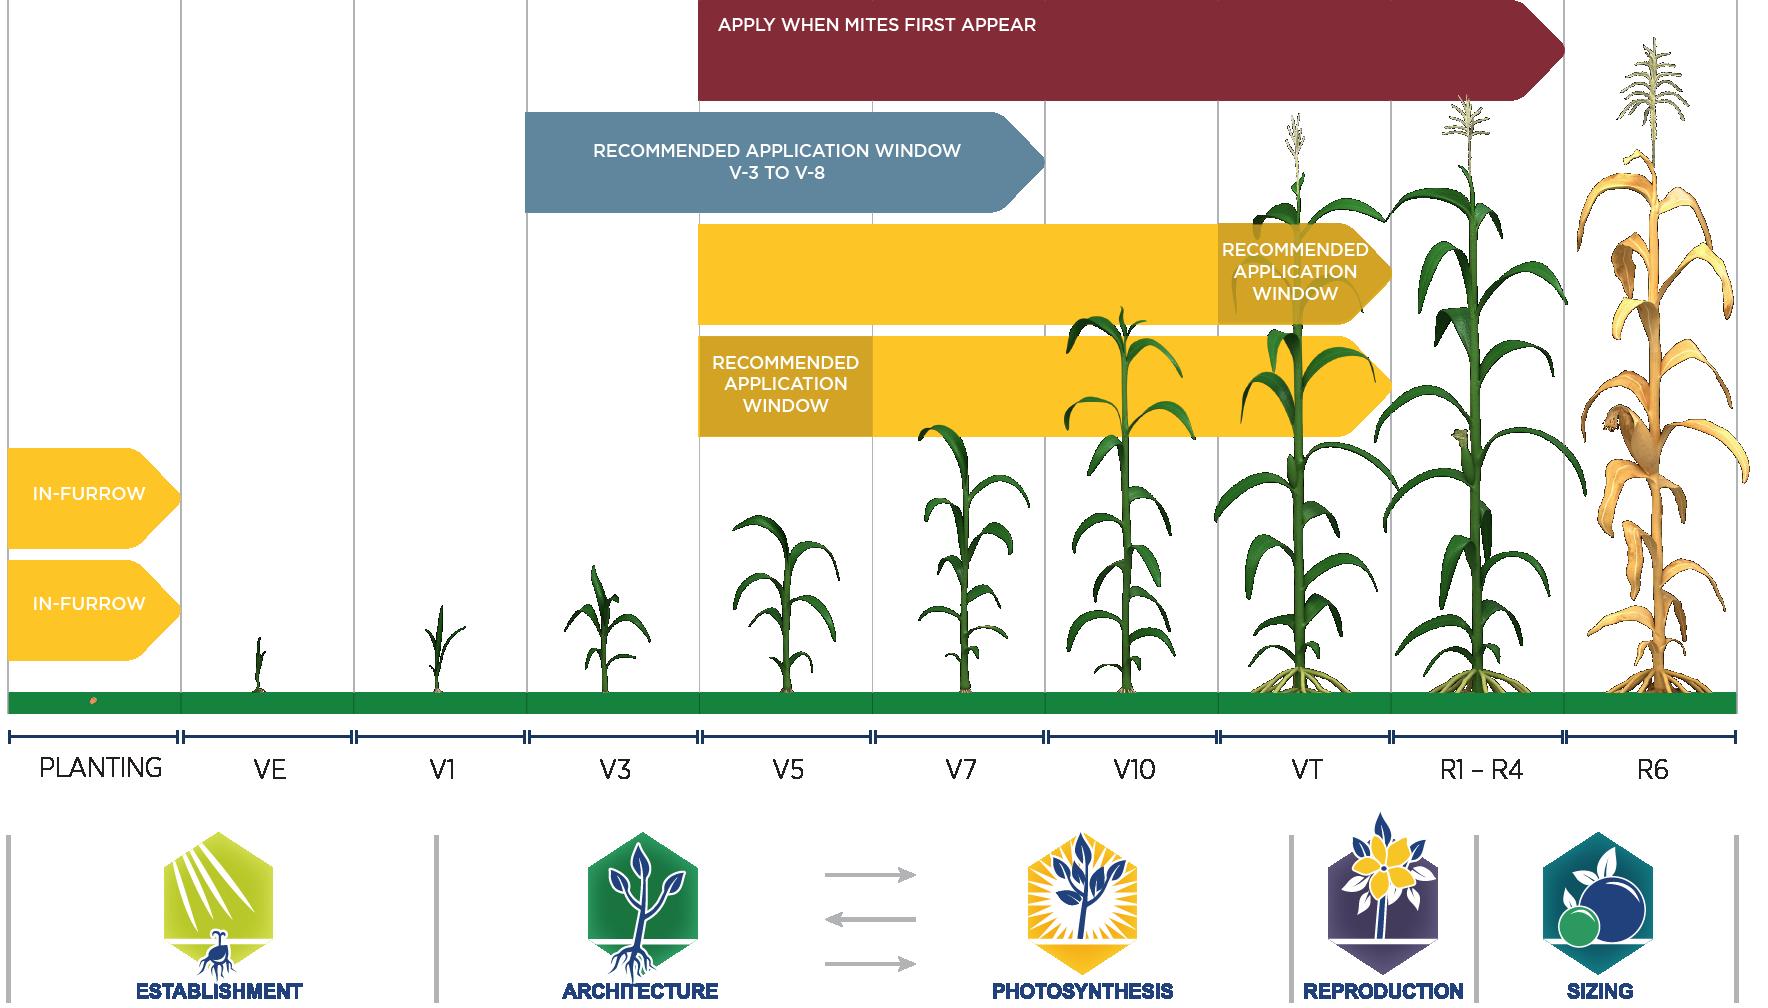 Corn & Soybean - UPL